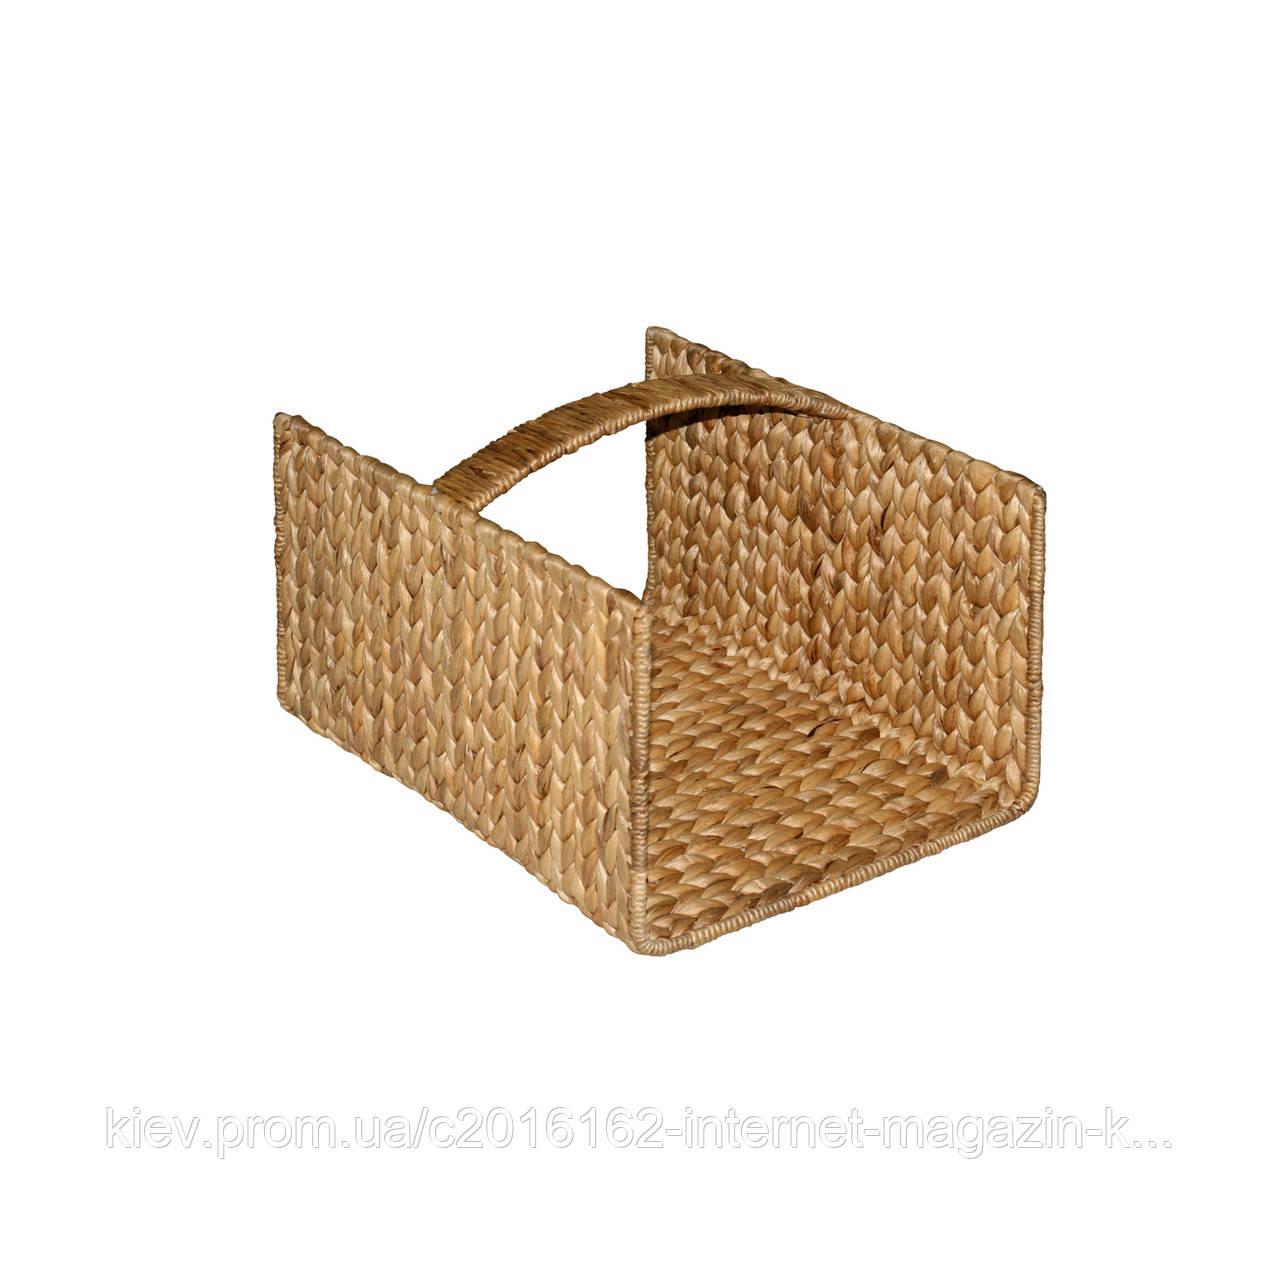 Корзинка для дров Home4You Hiver basket 1-s  38x30xH27cm  natur